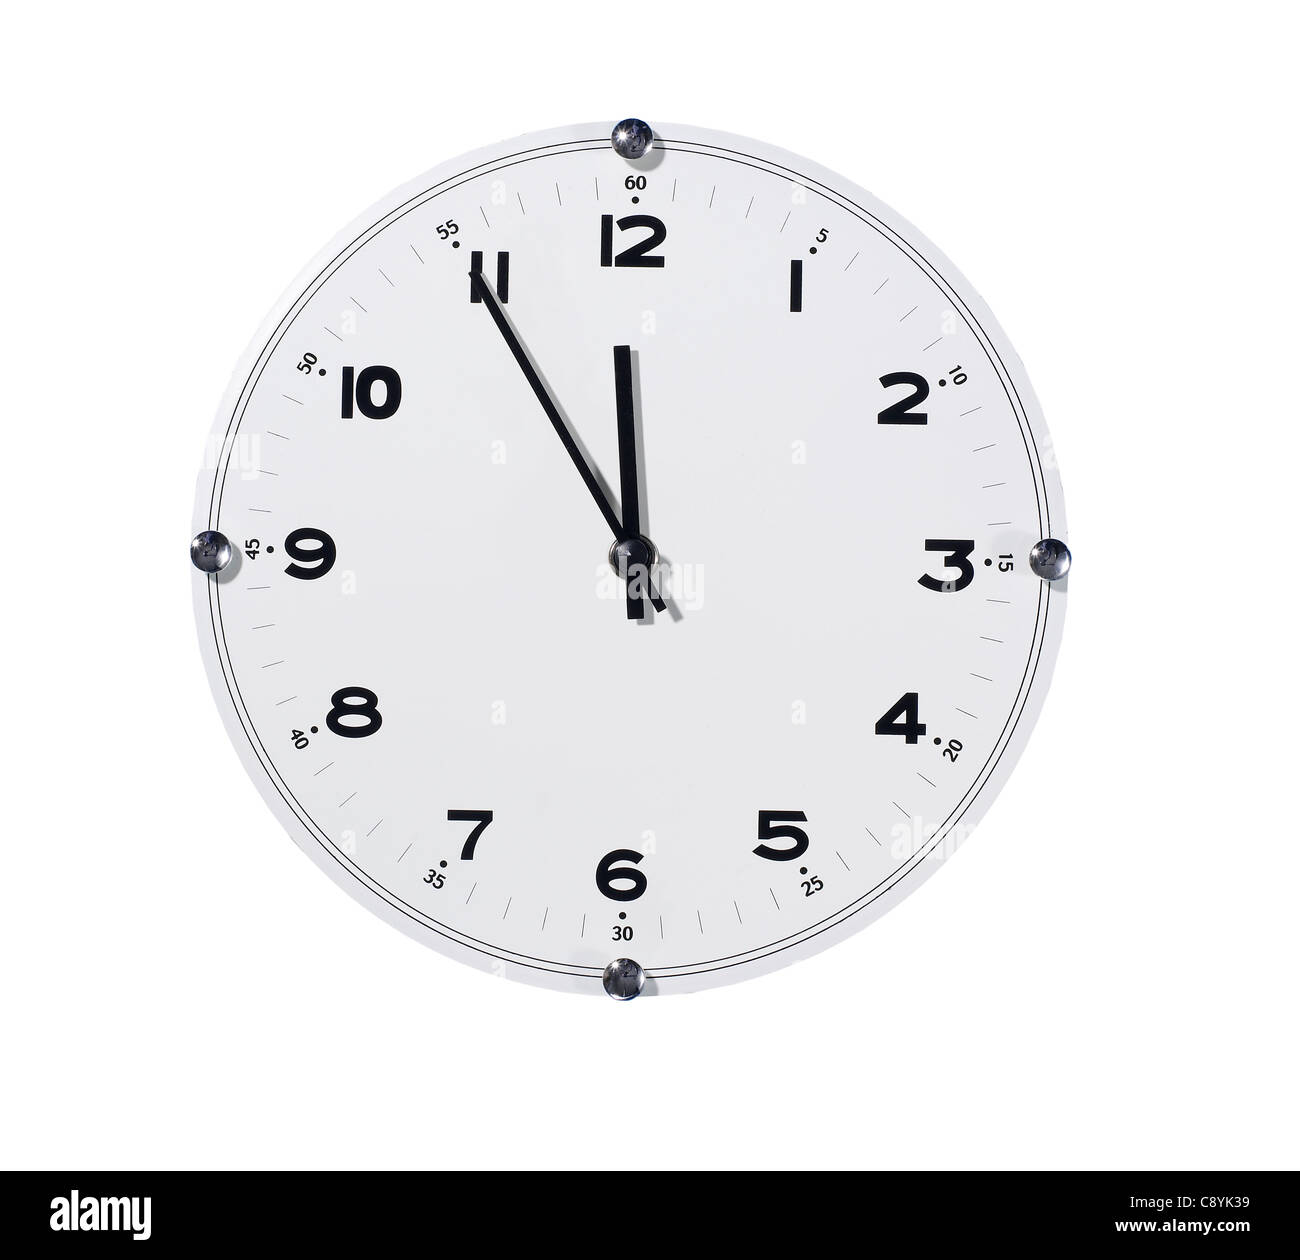 Clock stockfotos clock bilder alamy - Wanduhr originell ...